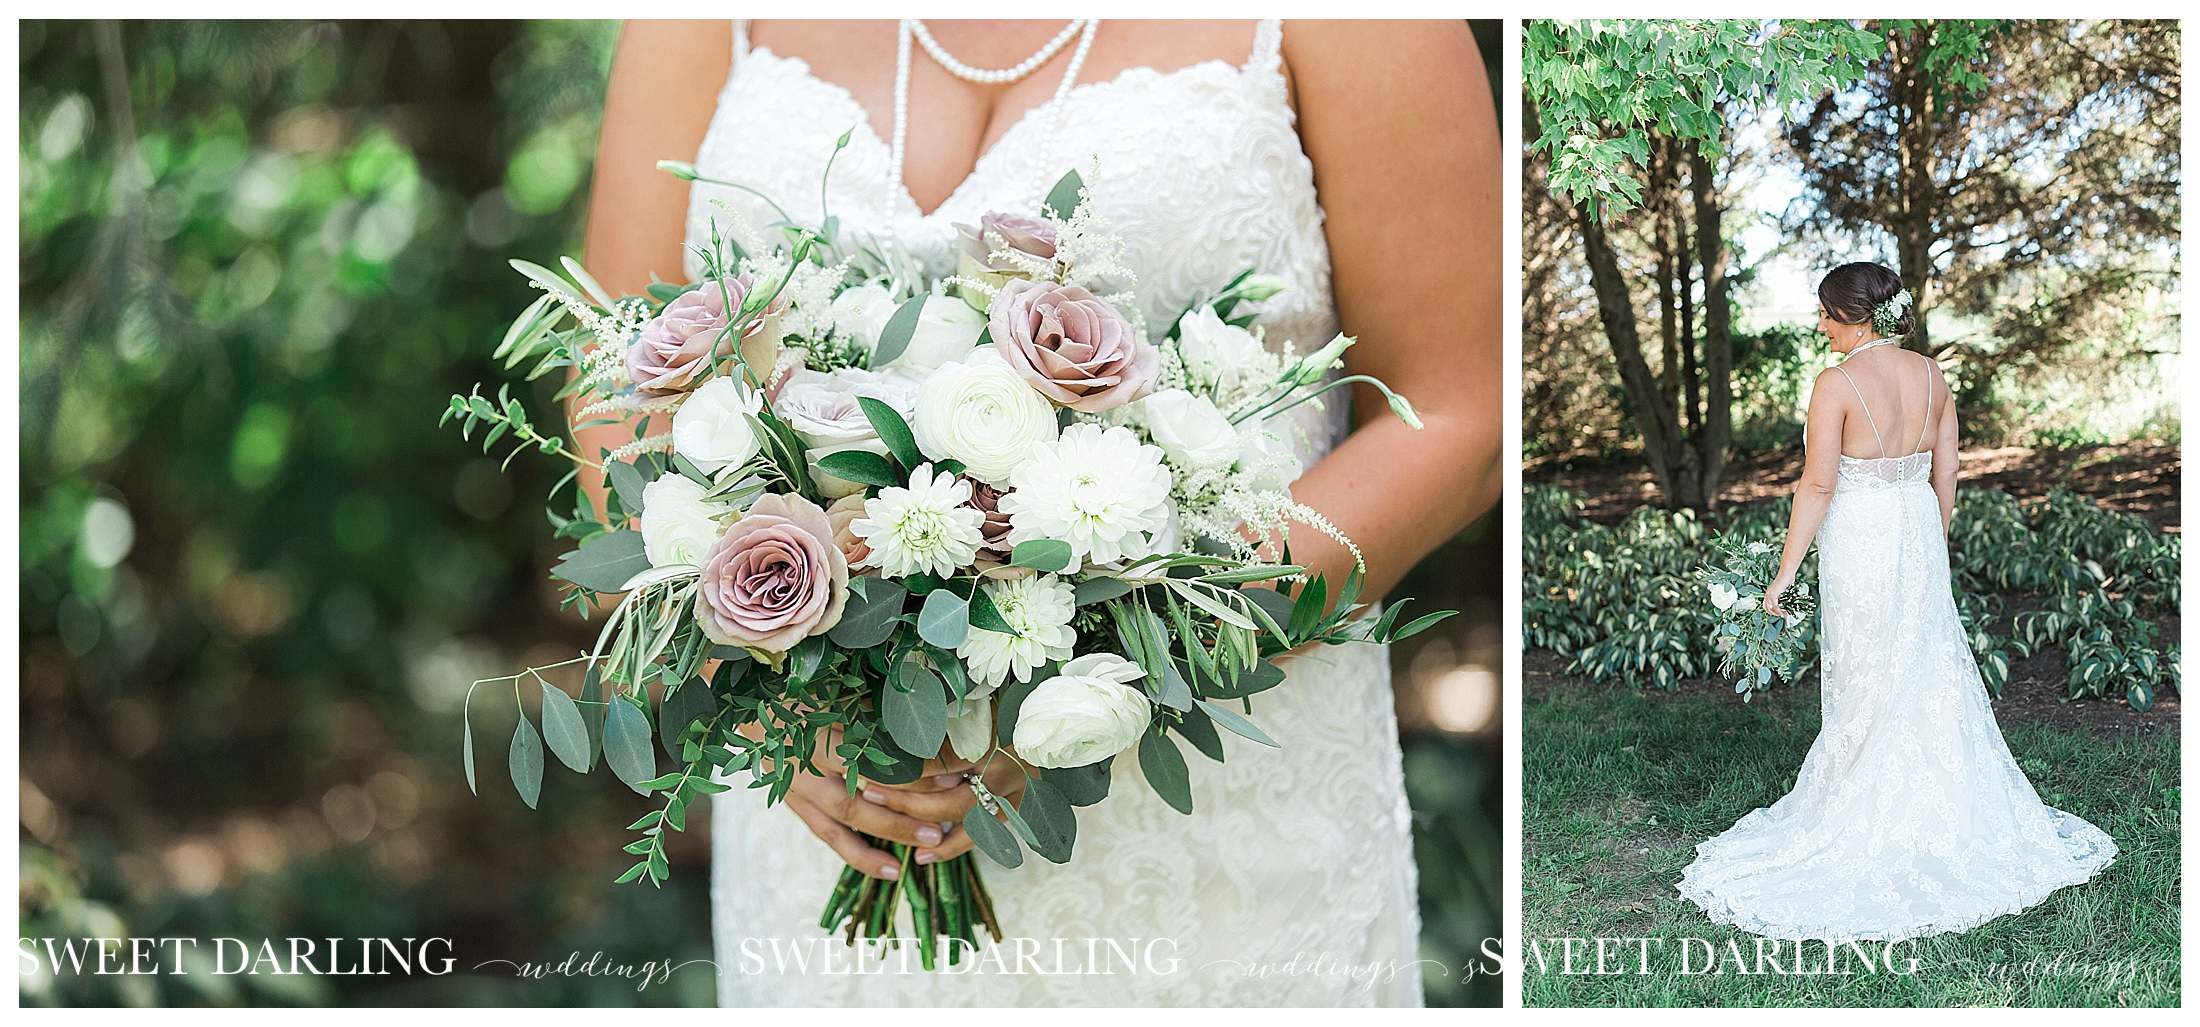 Bride holding bouquet at pear tree estae